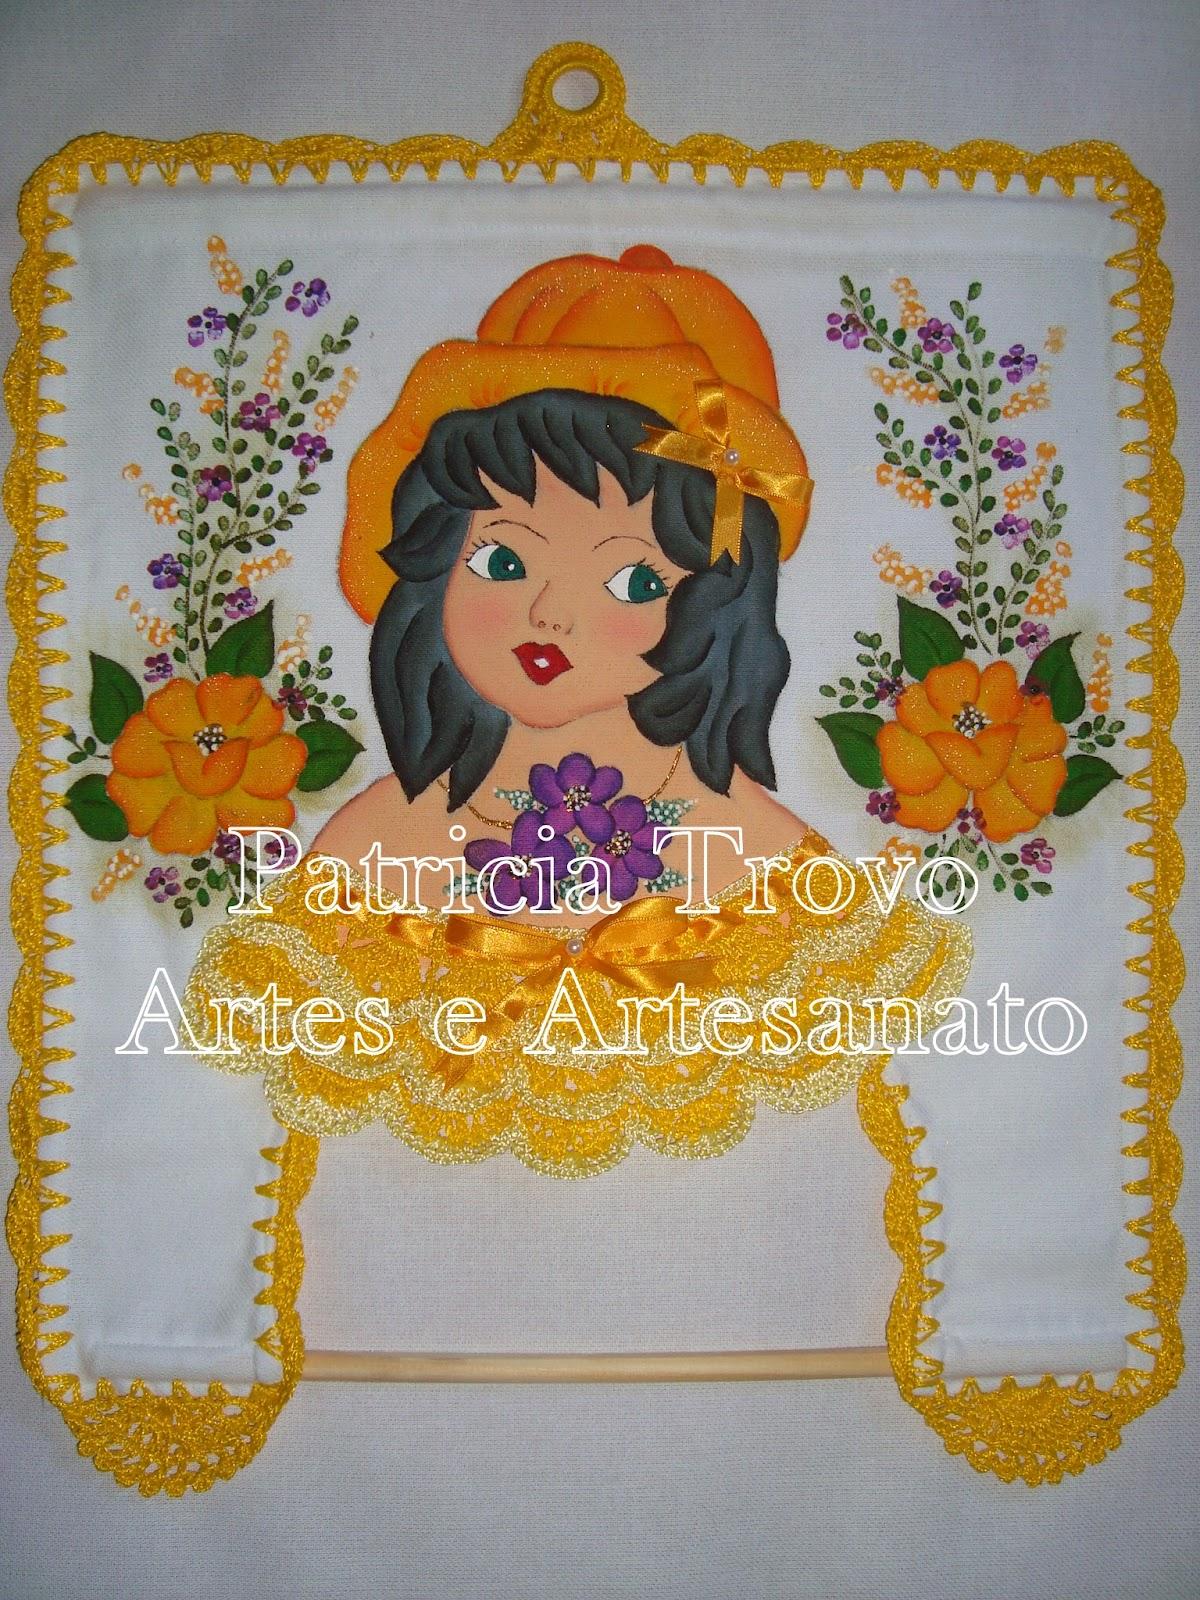 Armario Bebe El Corte Ingles ~ Patricia Trovo Artes e Artesanato PORTA PAPEL TOALHA Encomenda da amiga Silvina (RO)